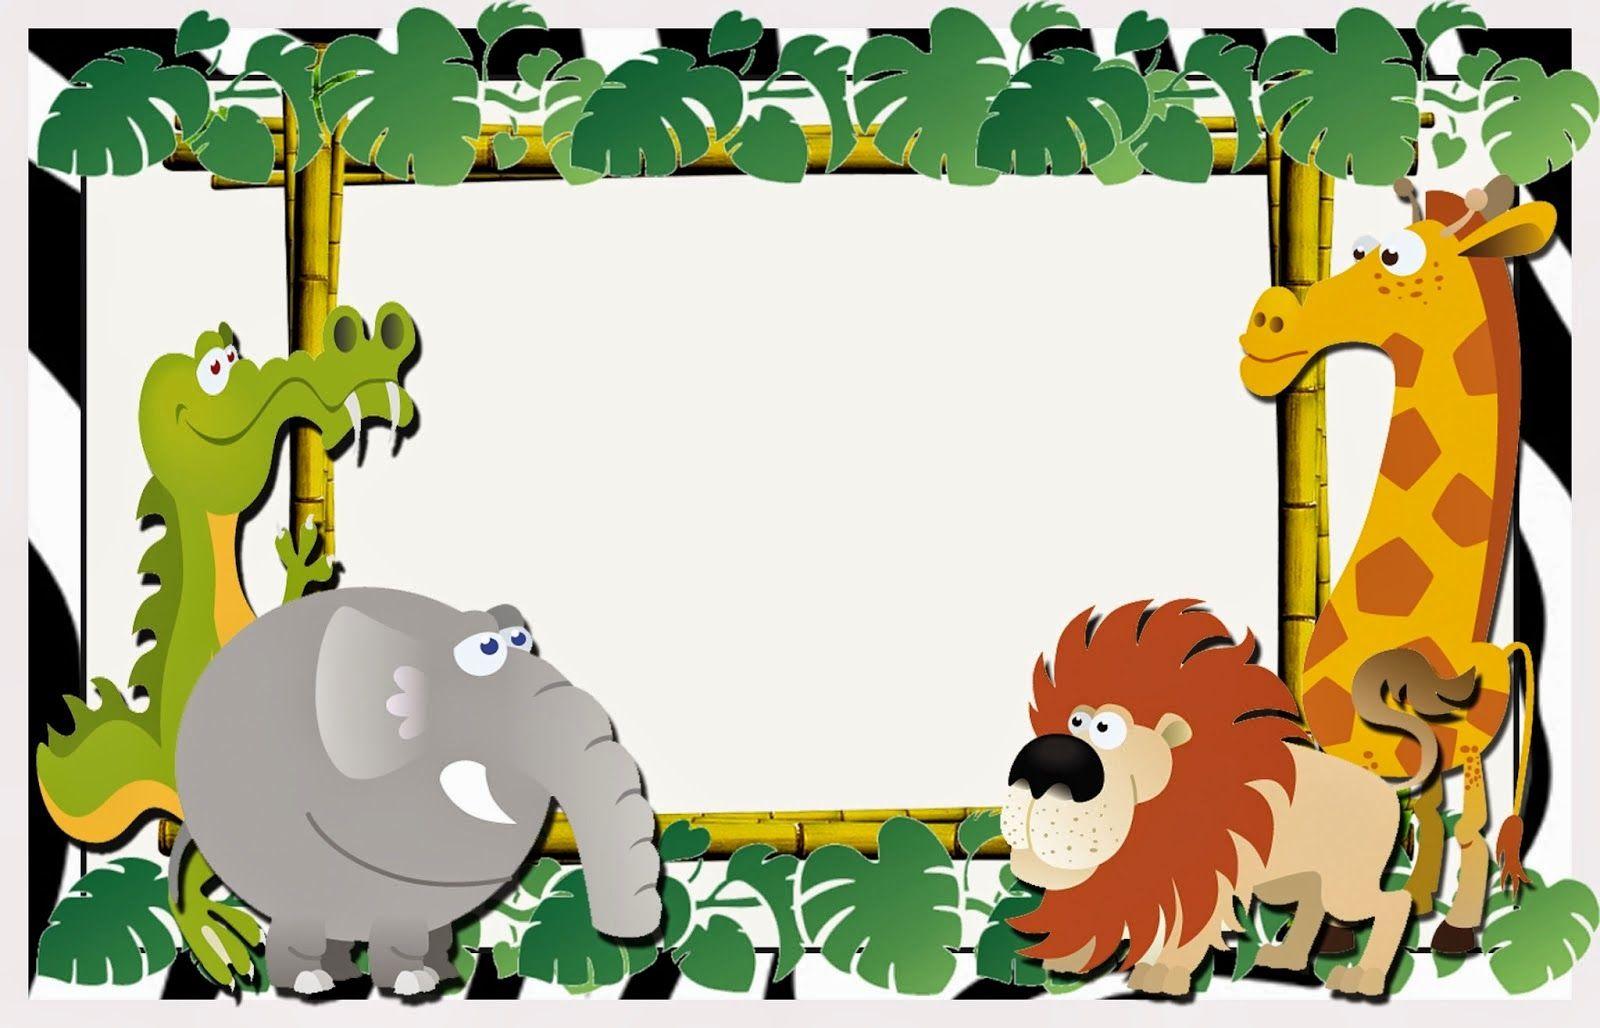 La Selva: Invitaciones para Imprimir Gratis. | animalitos ...